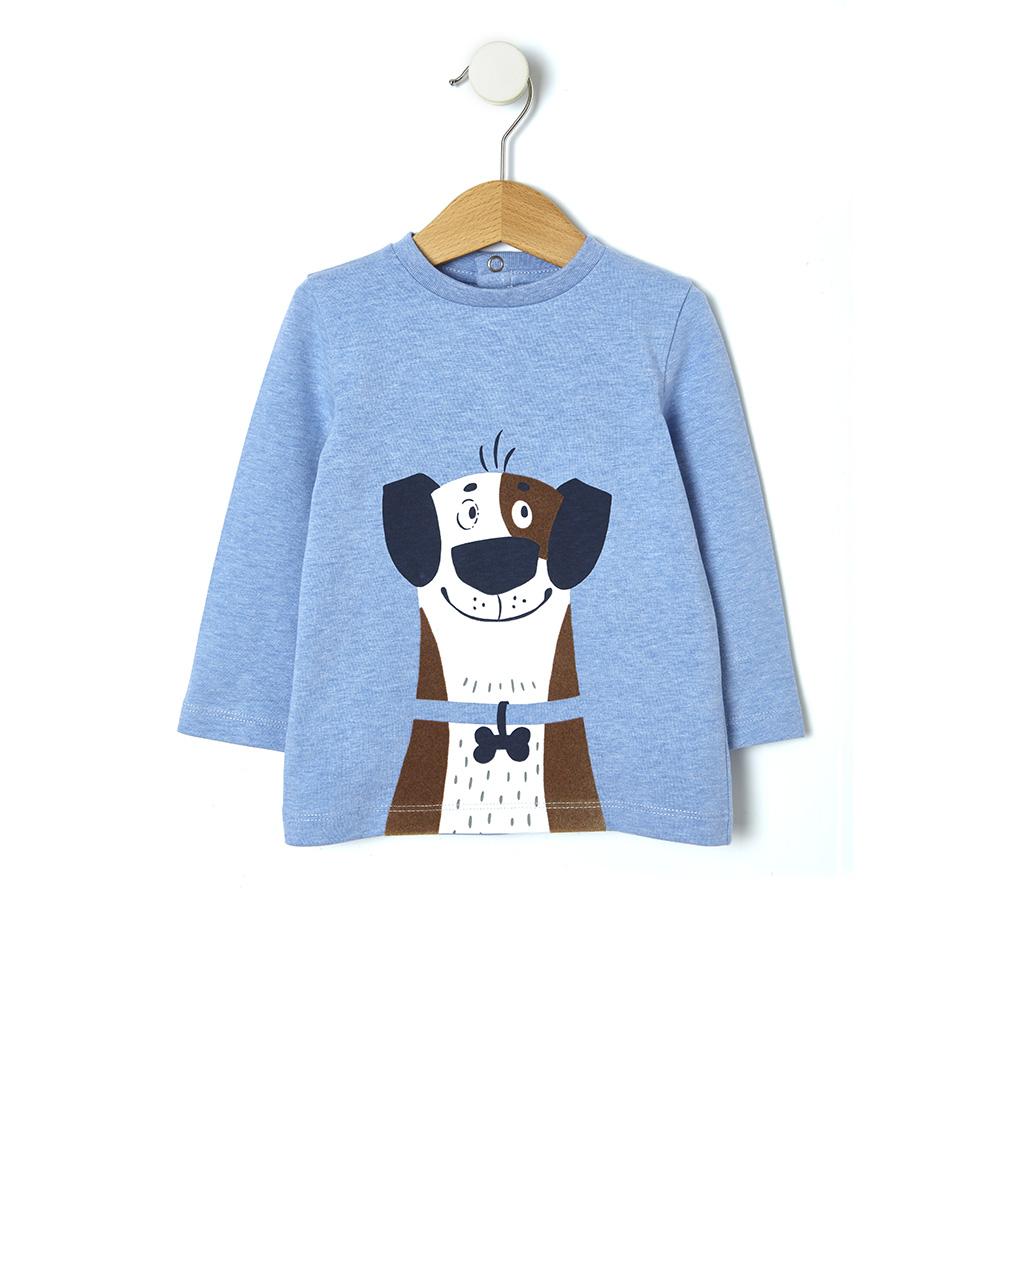 T-shirt με στάμπα σκυλάκι